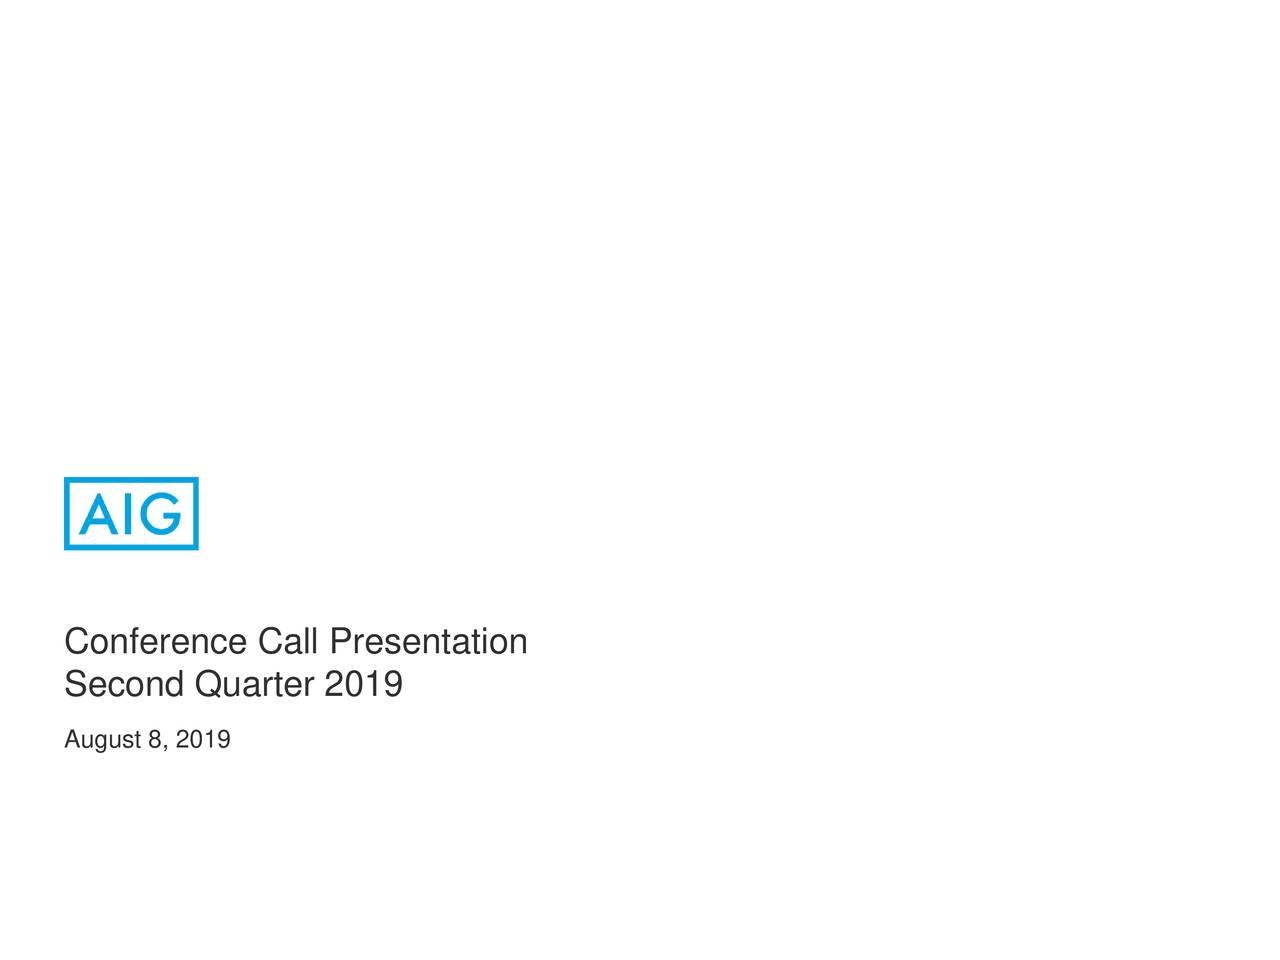 Conference Call Presentation